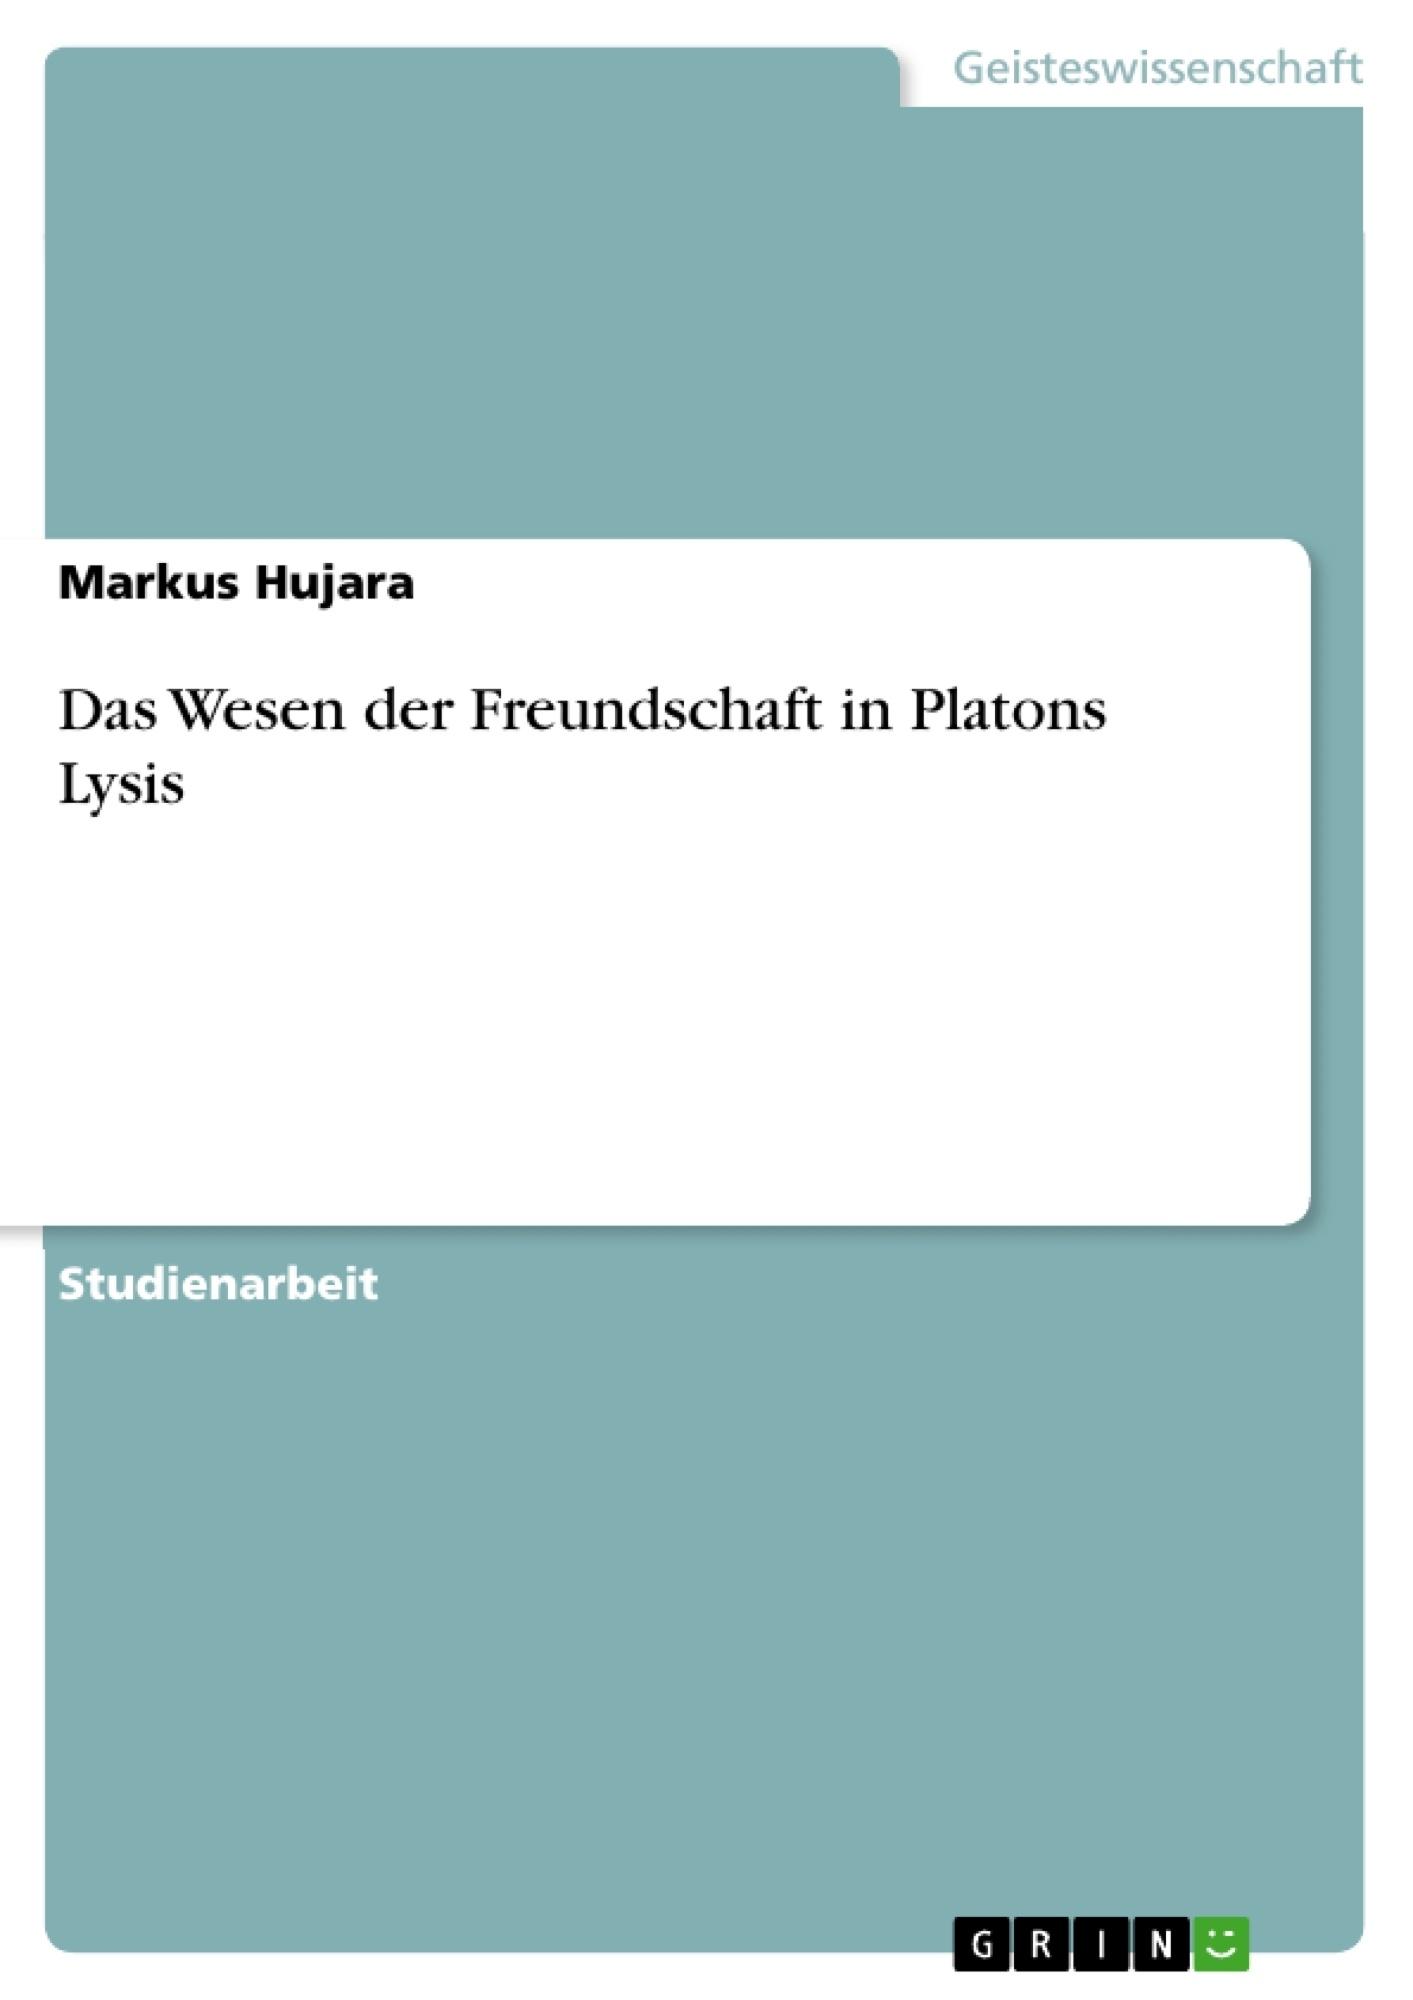 Titel: Das Wesen der Freundschaft in Platons Lysis